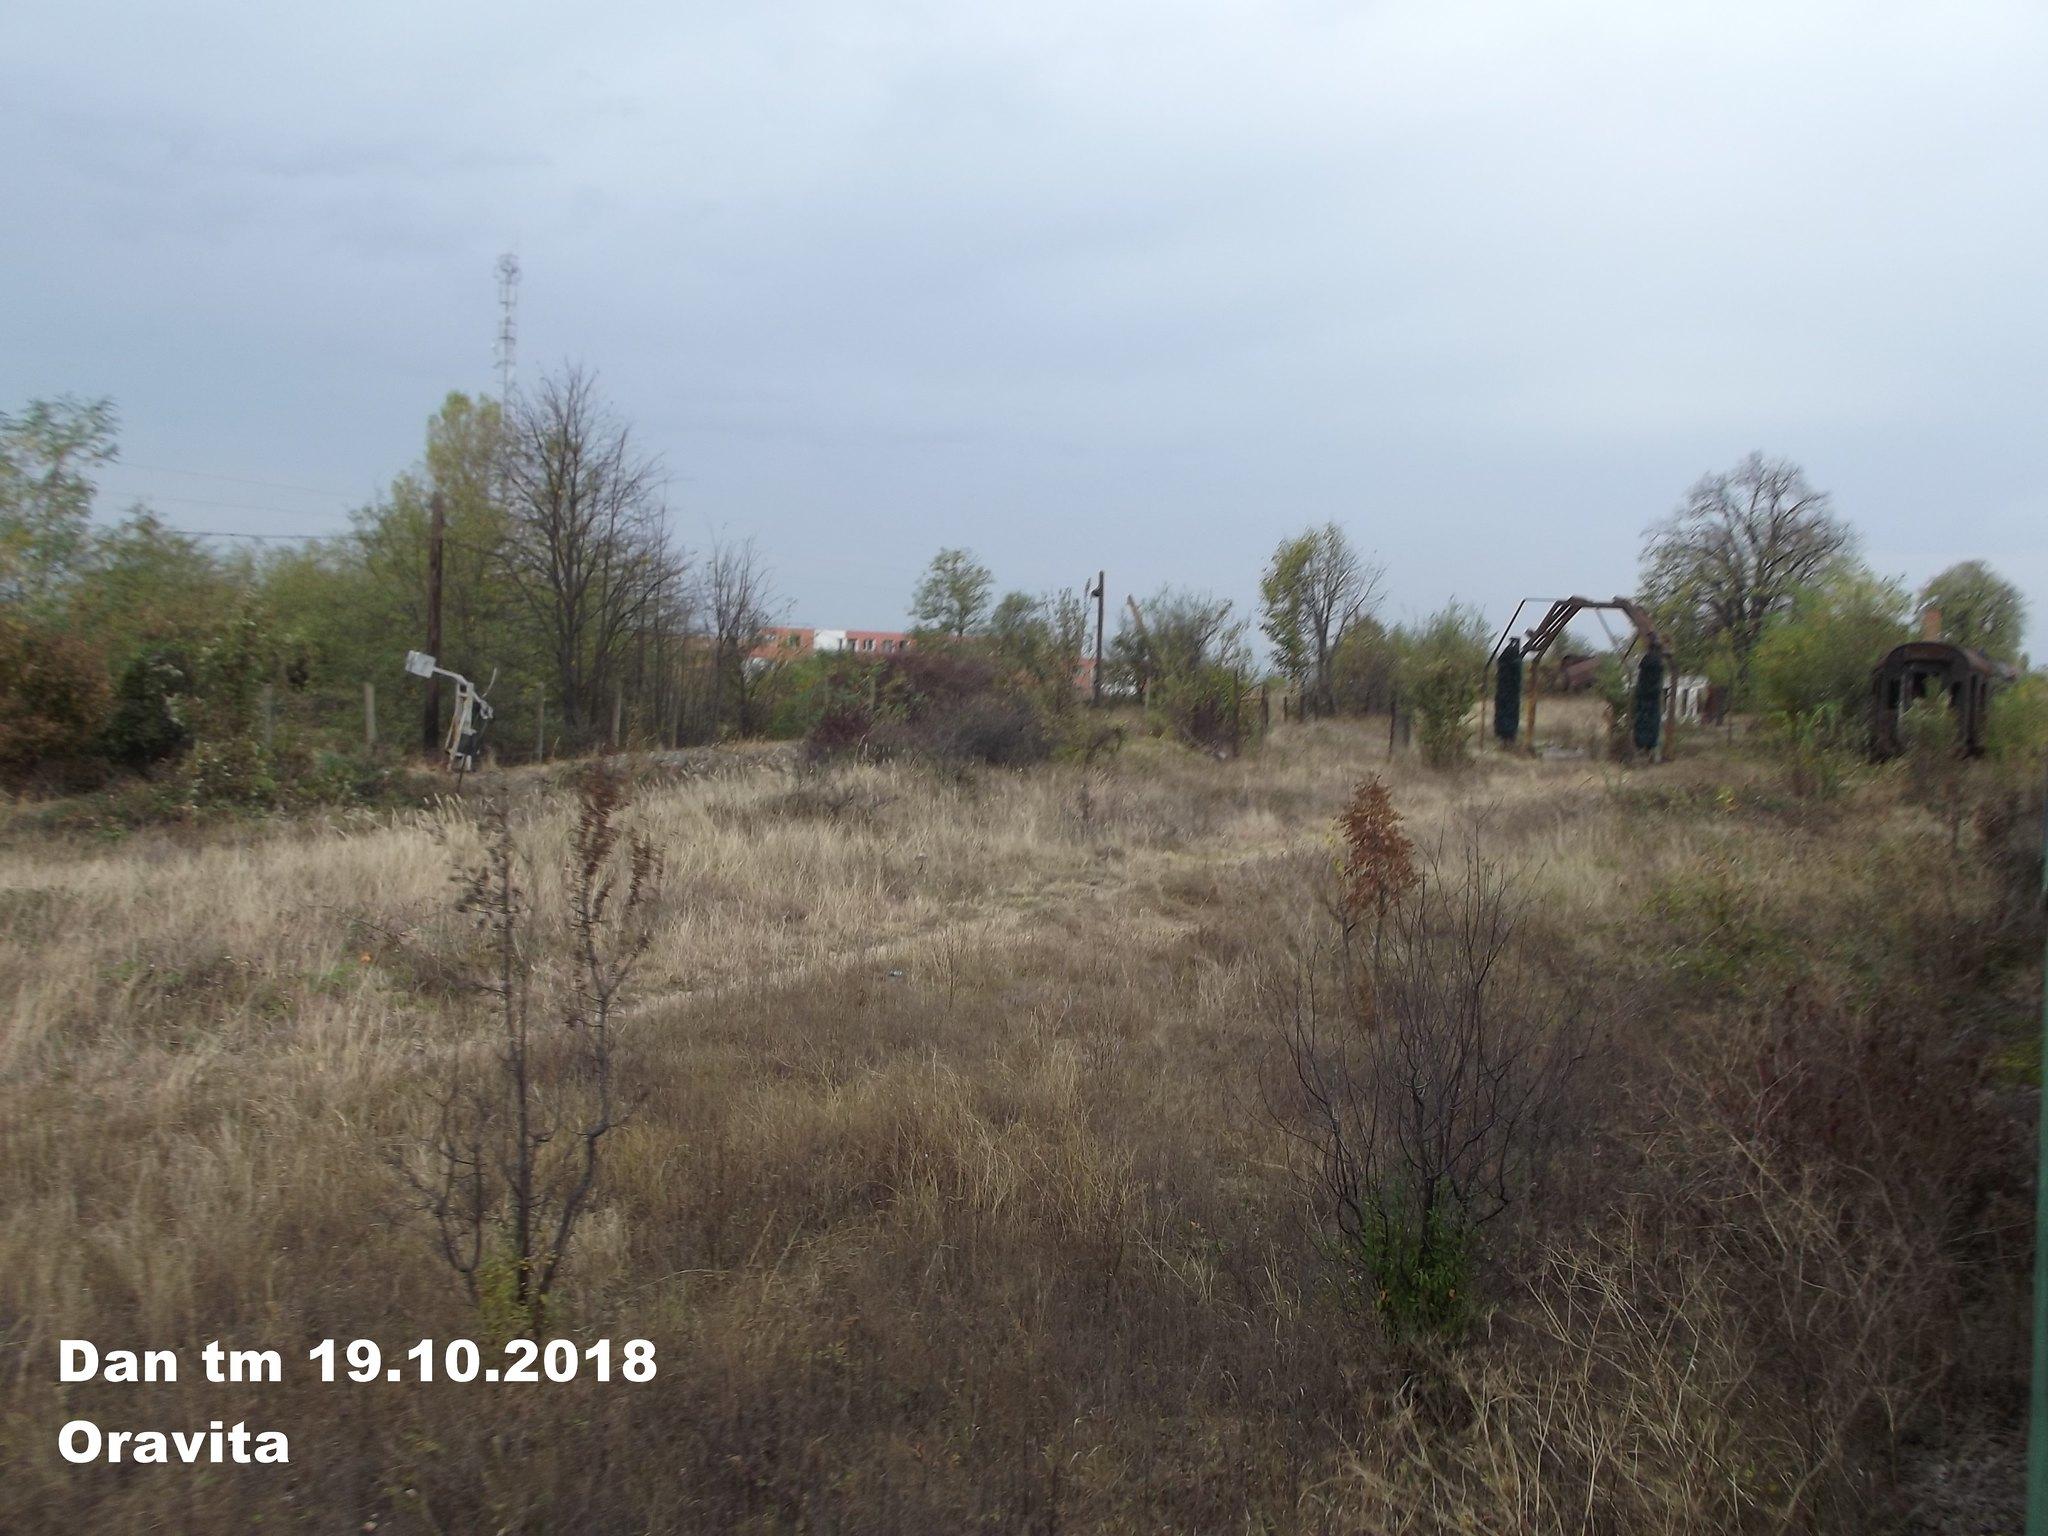 925 : Oravita - Anina - Pagina 40 43654020060_a9d138272d_k